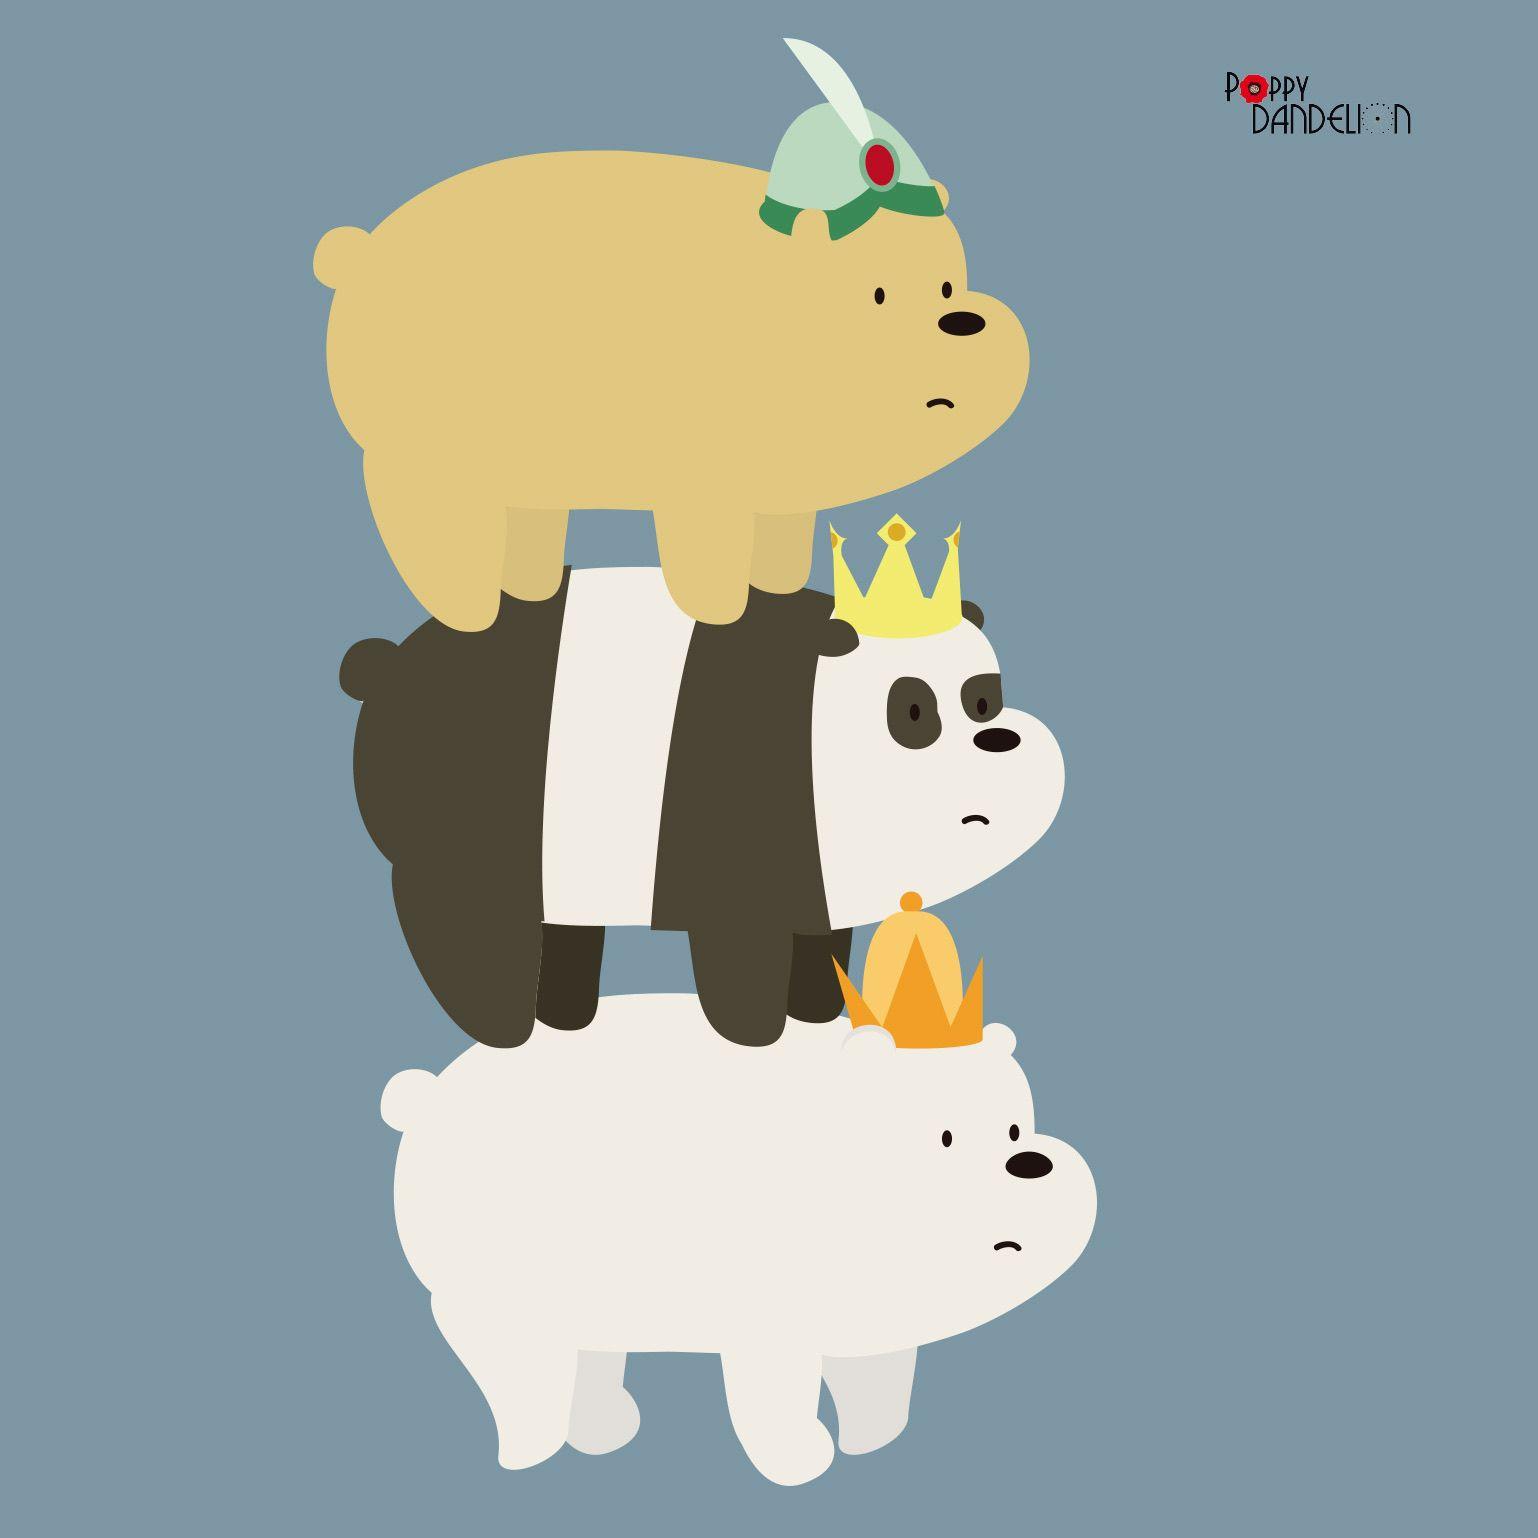 ...  illustrator  adobeillustrator  vector  characterdesign  bears  dibujo   ilustración  dibujovectorial  diseño  diseñopersonajes  osos   cartoonnetwork 1266c9aee1d